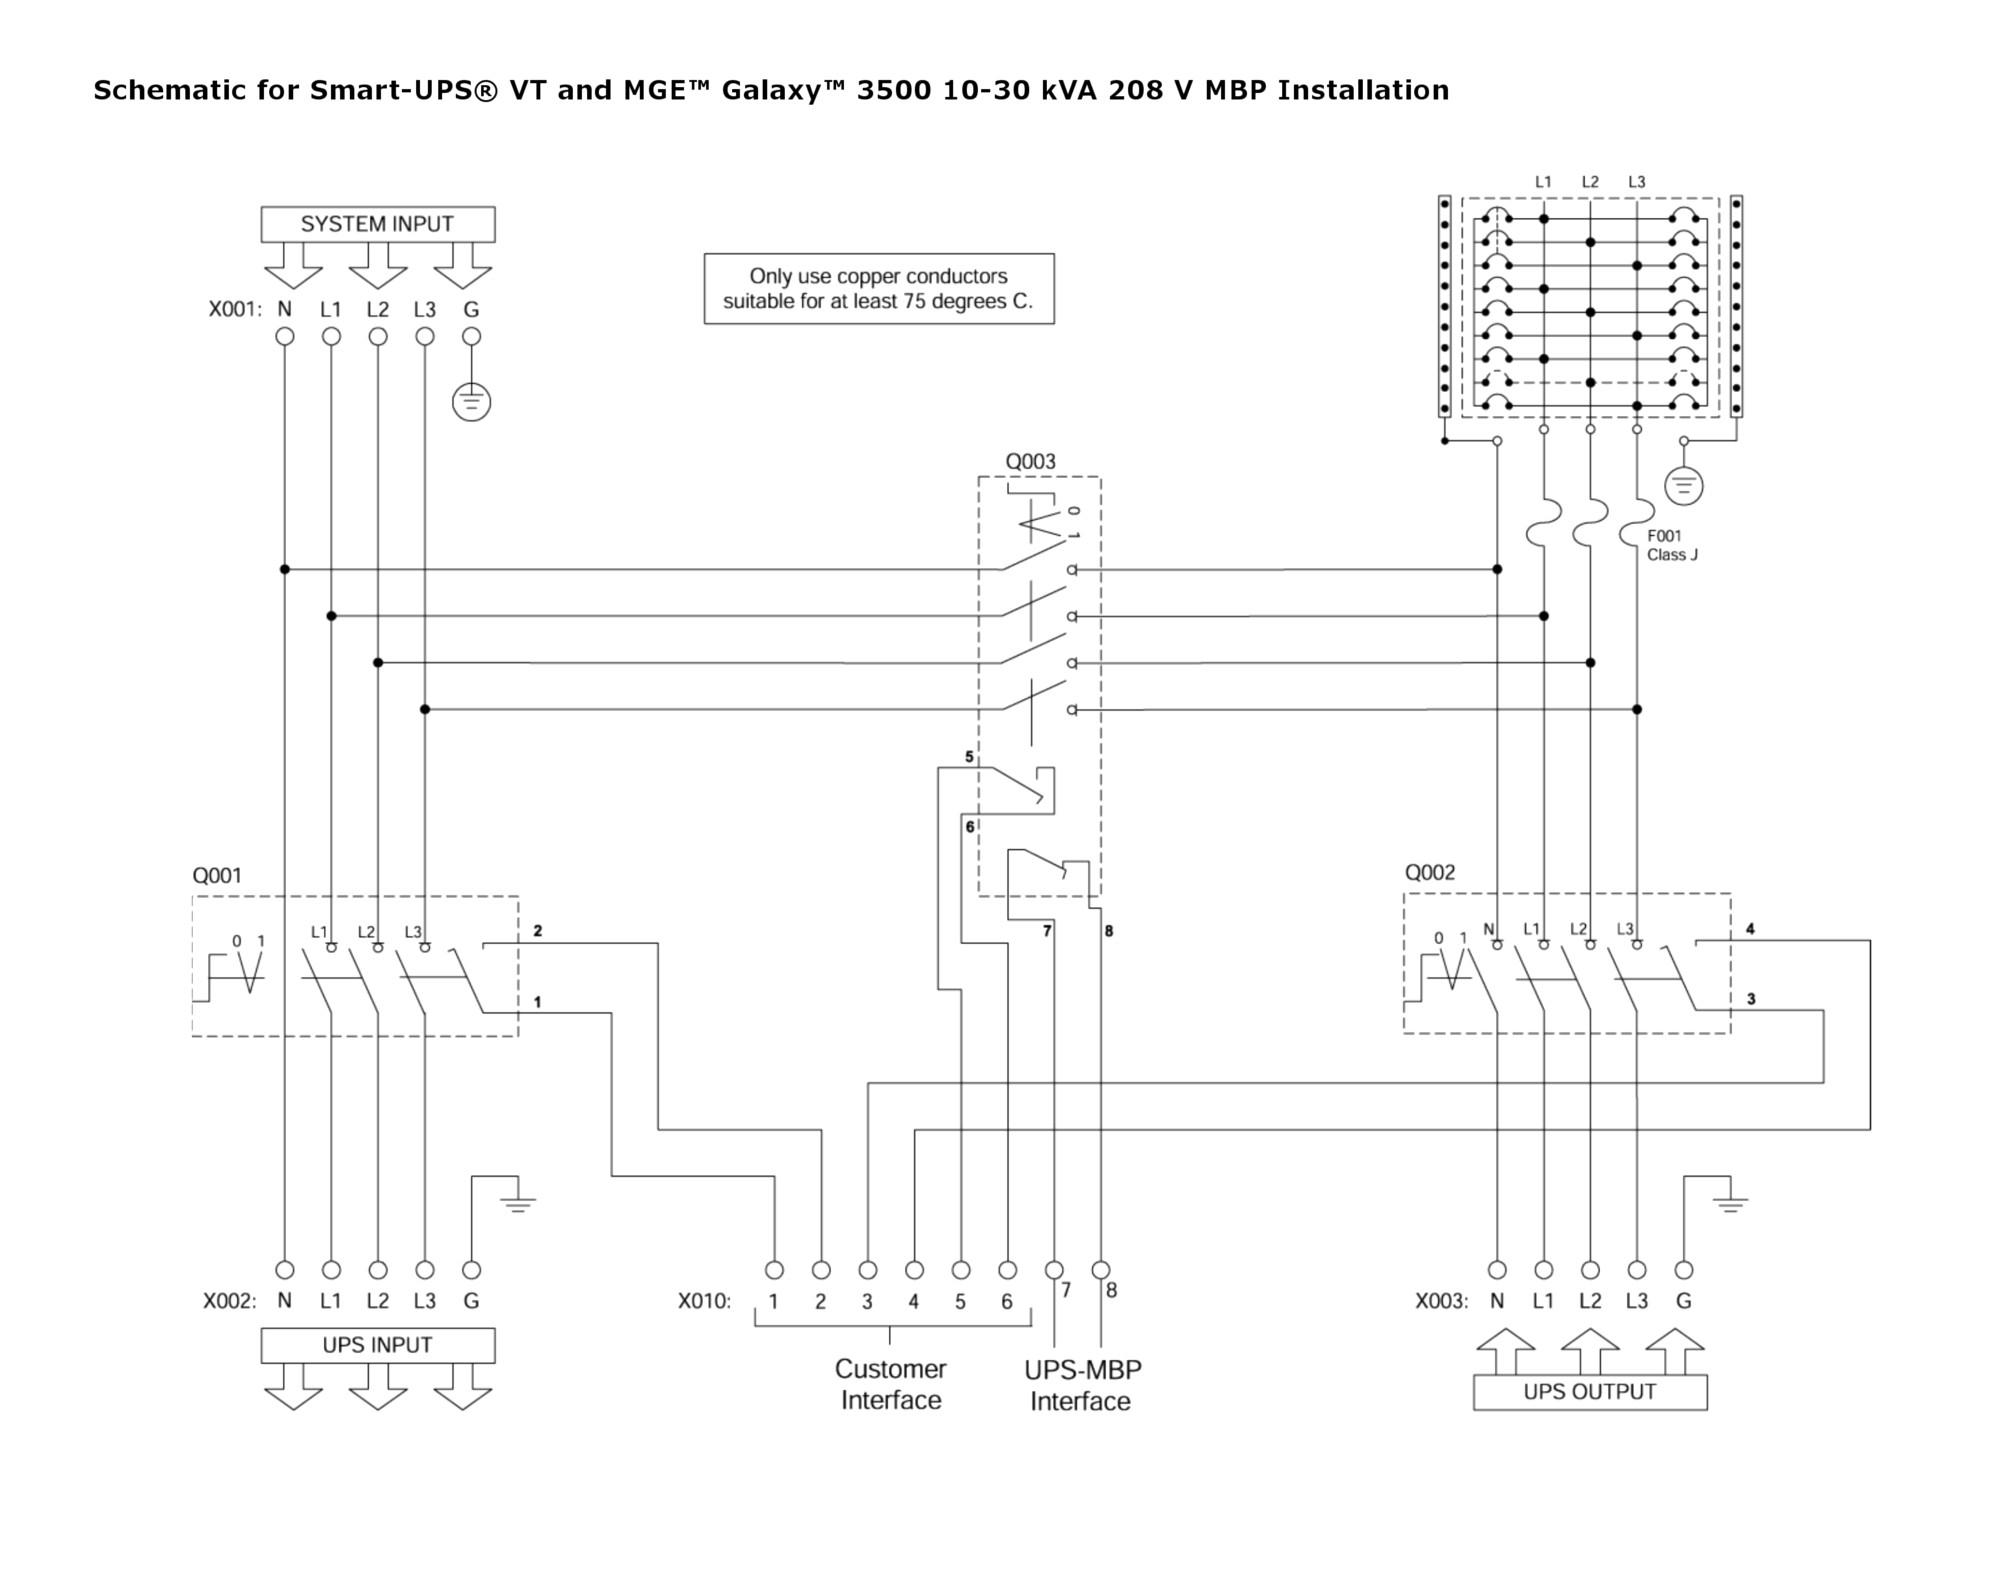 apc epo wiring diagram Download-apc wiring diagram wire center u2022 rh wiringgoo co Electric Heat Pump Wiring Diagram Electric Heat 10-f